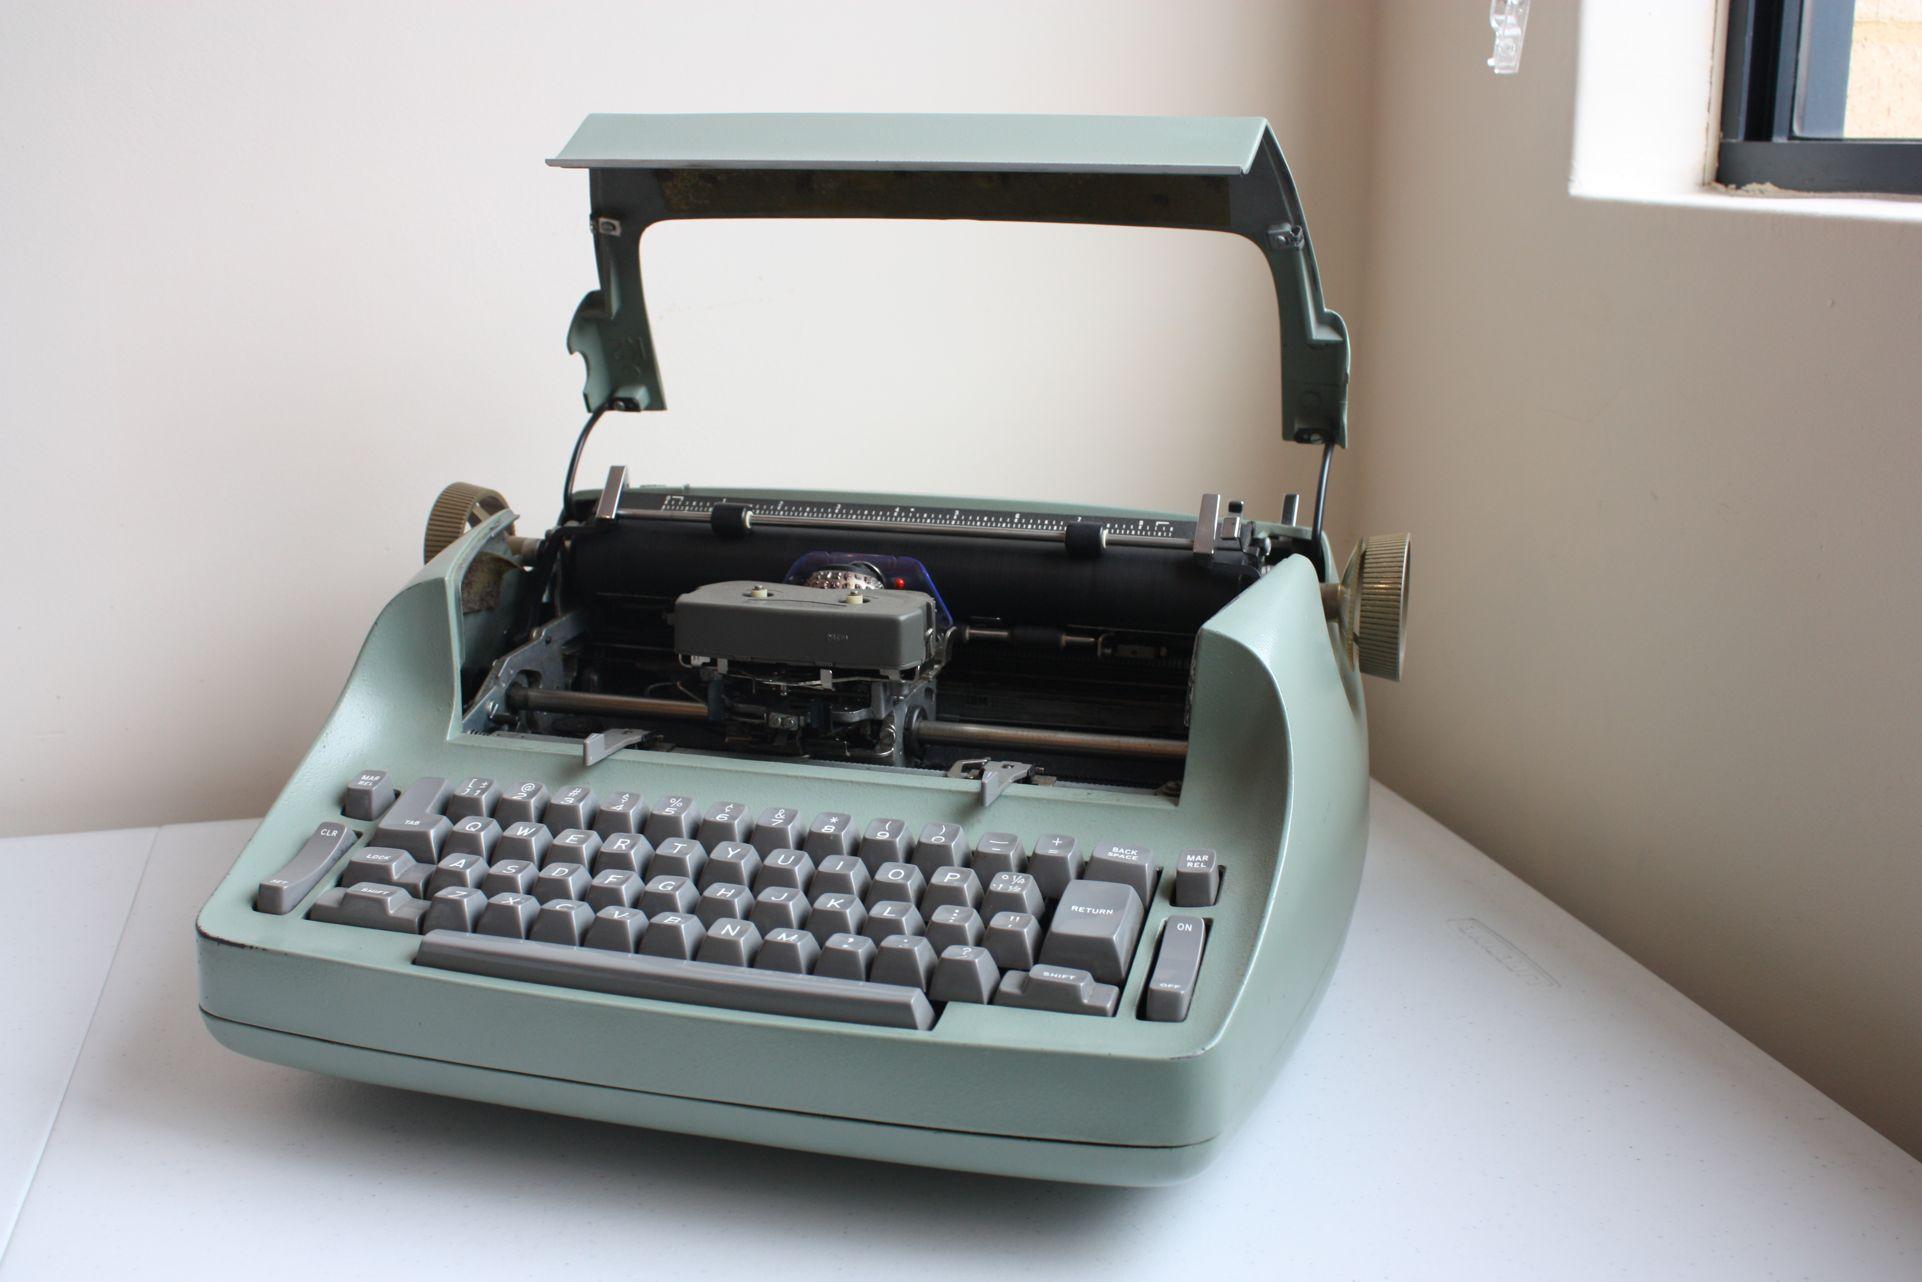 технологии второй половины 20 века: IBM Selectric